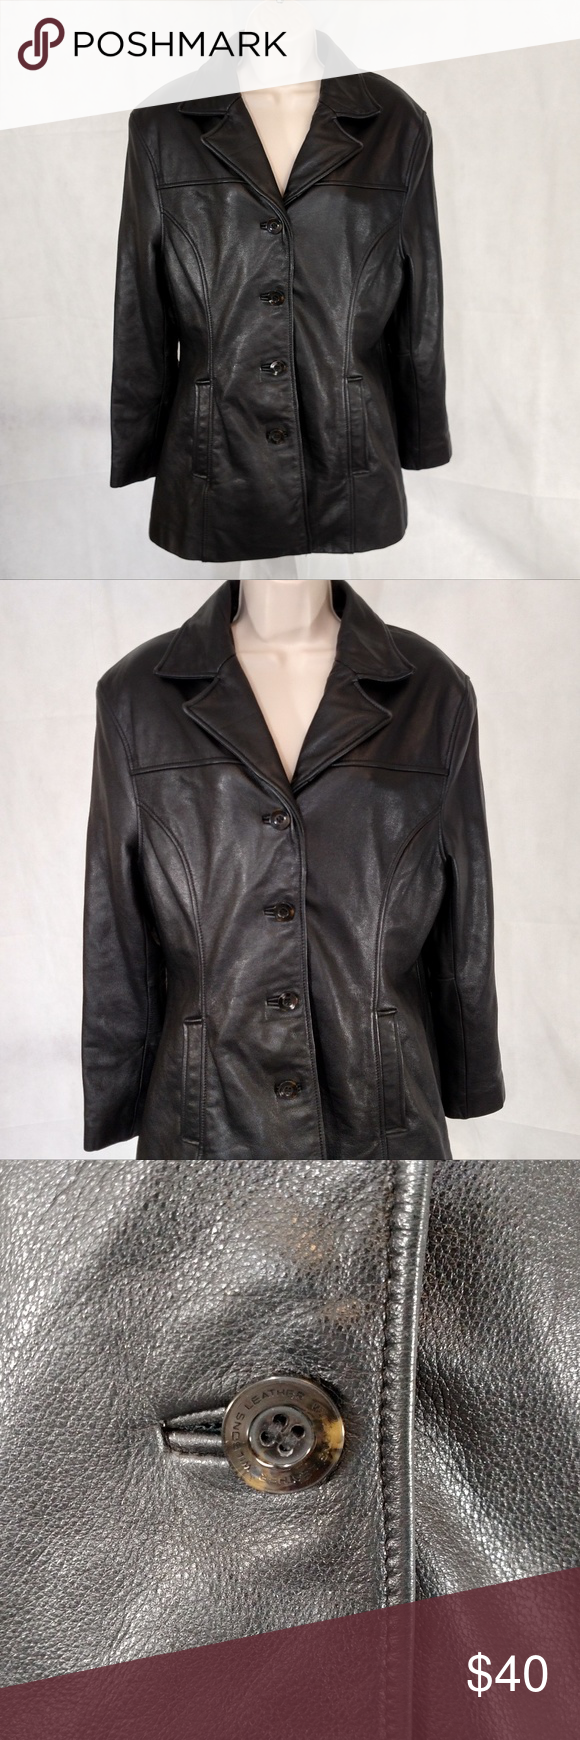 WILSONS LEATHER Jacket Women Size L Black Lined Wilsons